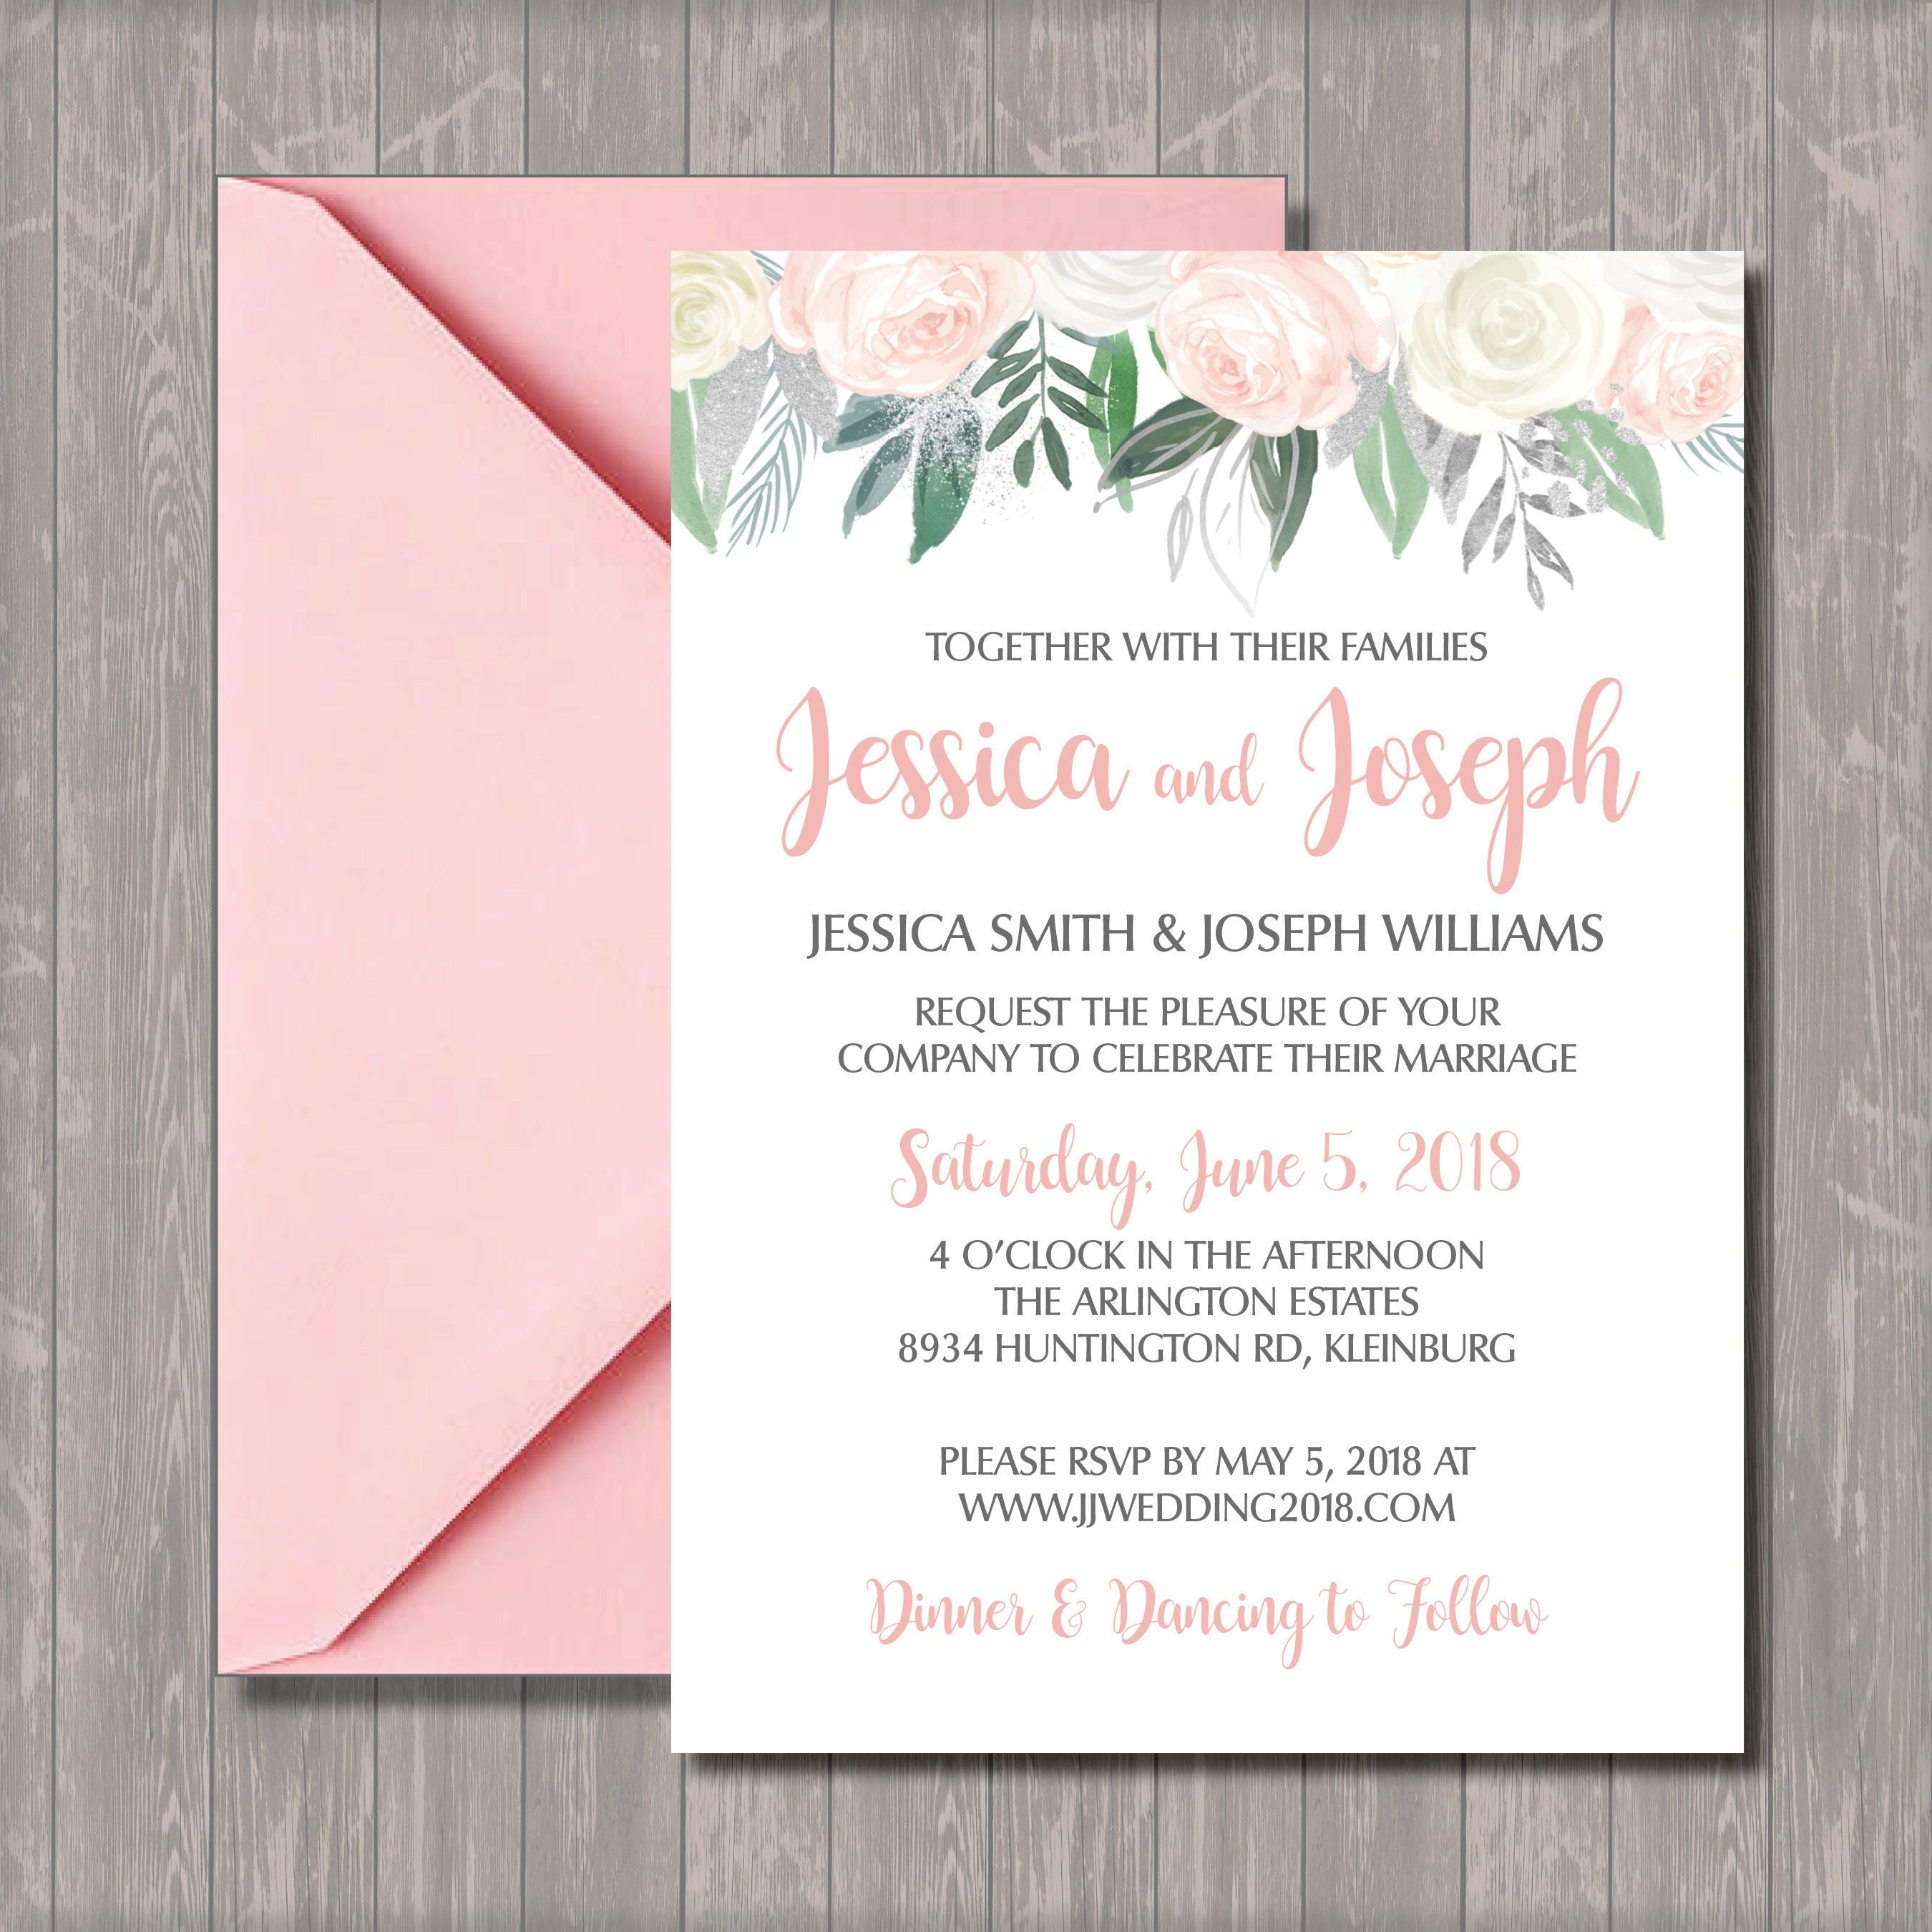 Custom Wedding Invitation And Rsvp Digital Download Pink